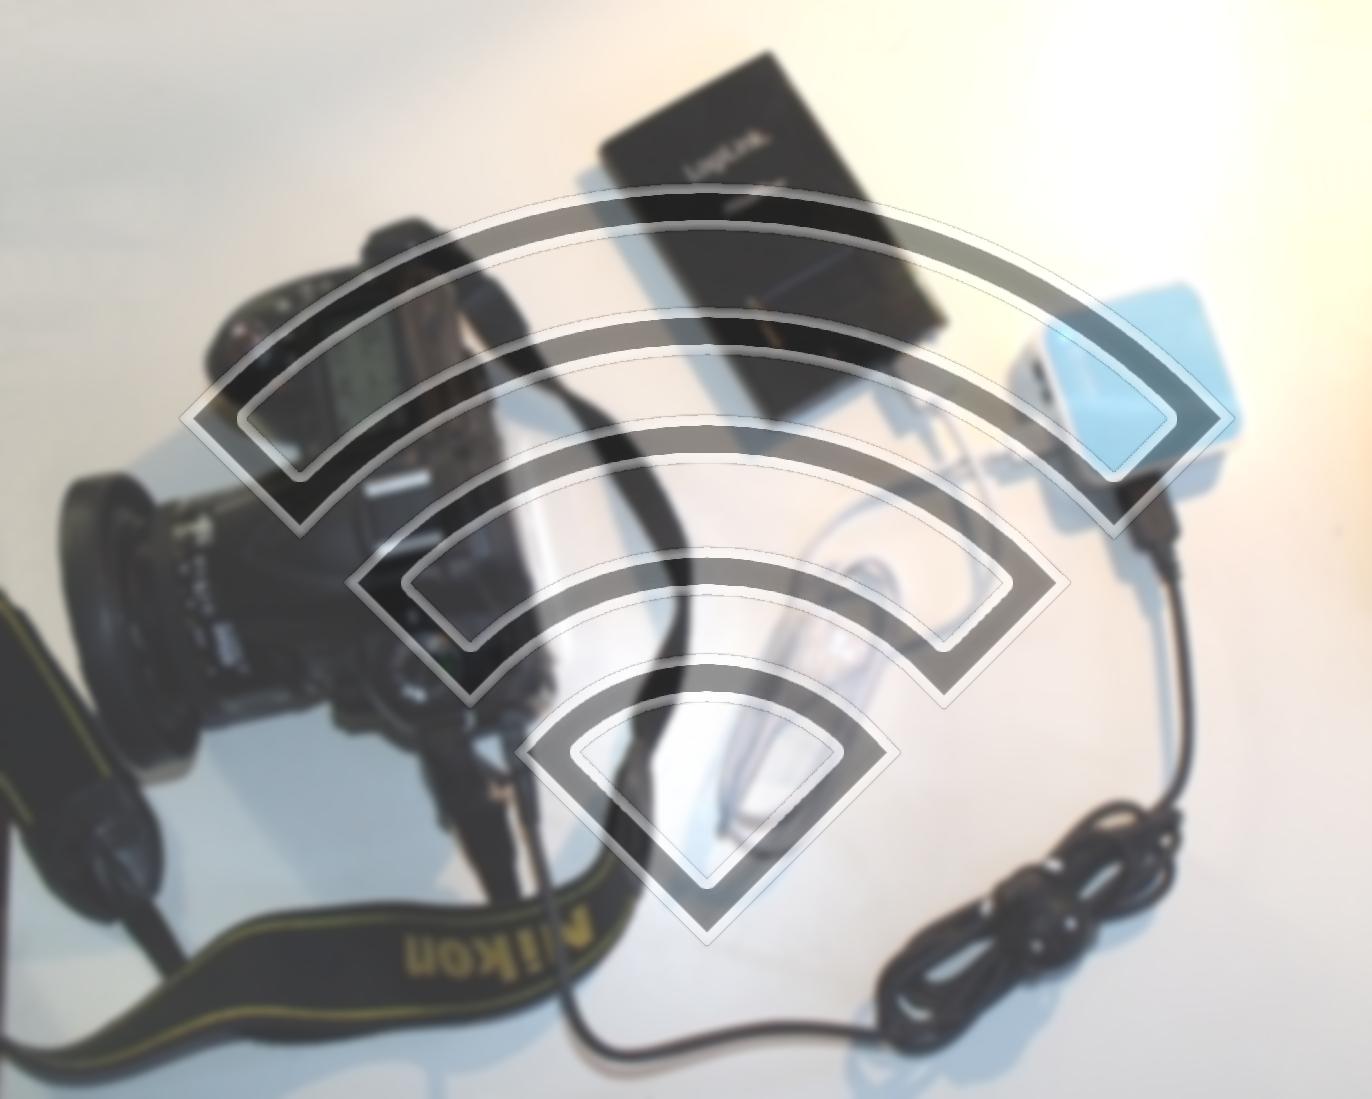 Anleitung: DSLR per WLAN mit dem Smartphone verbinden